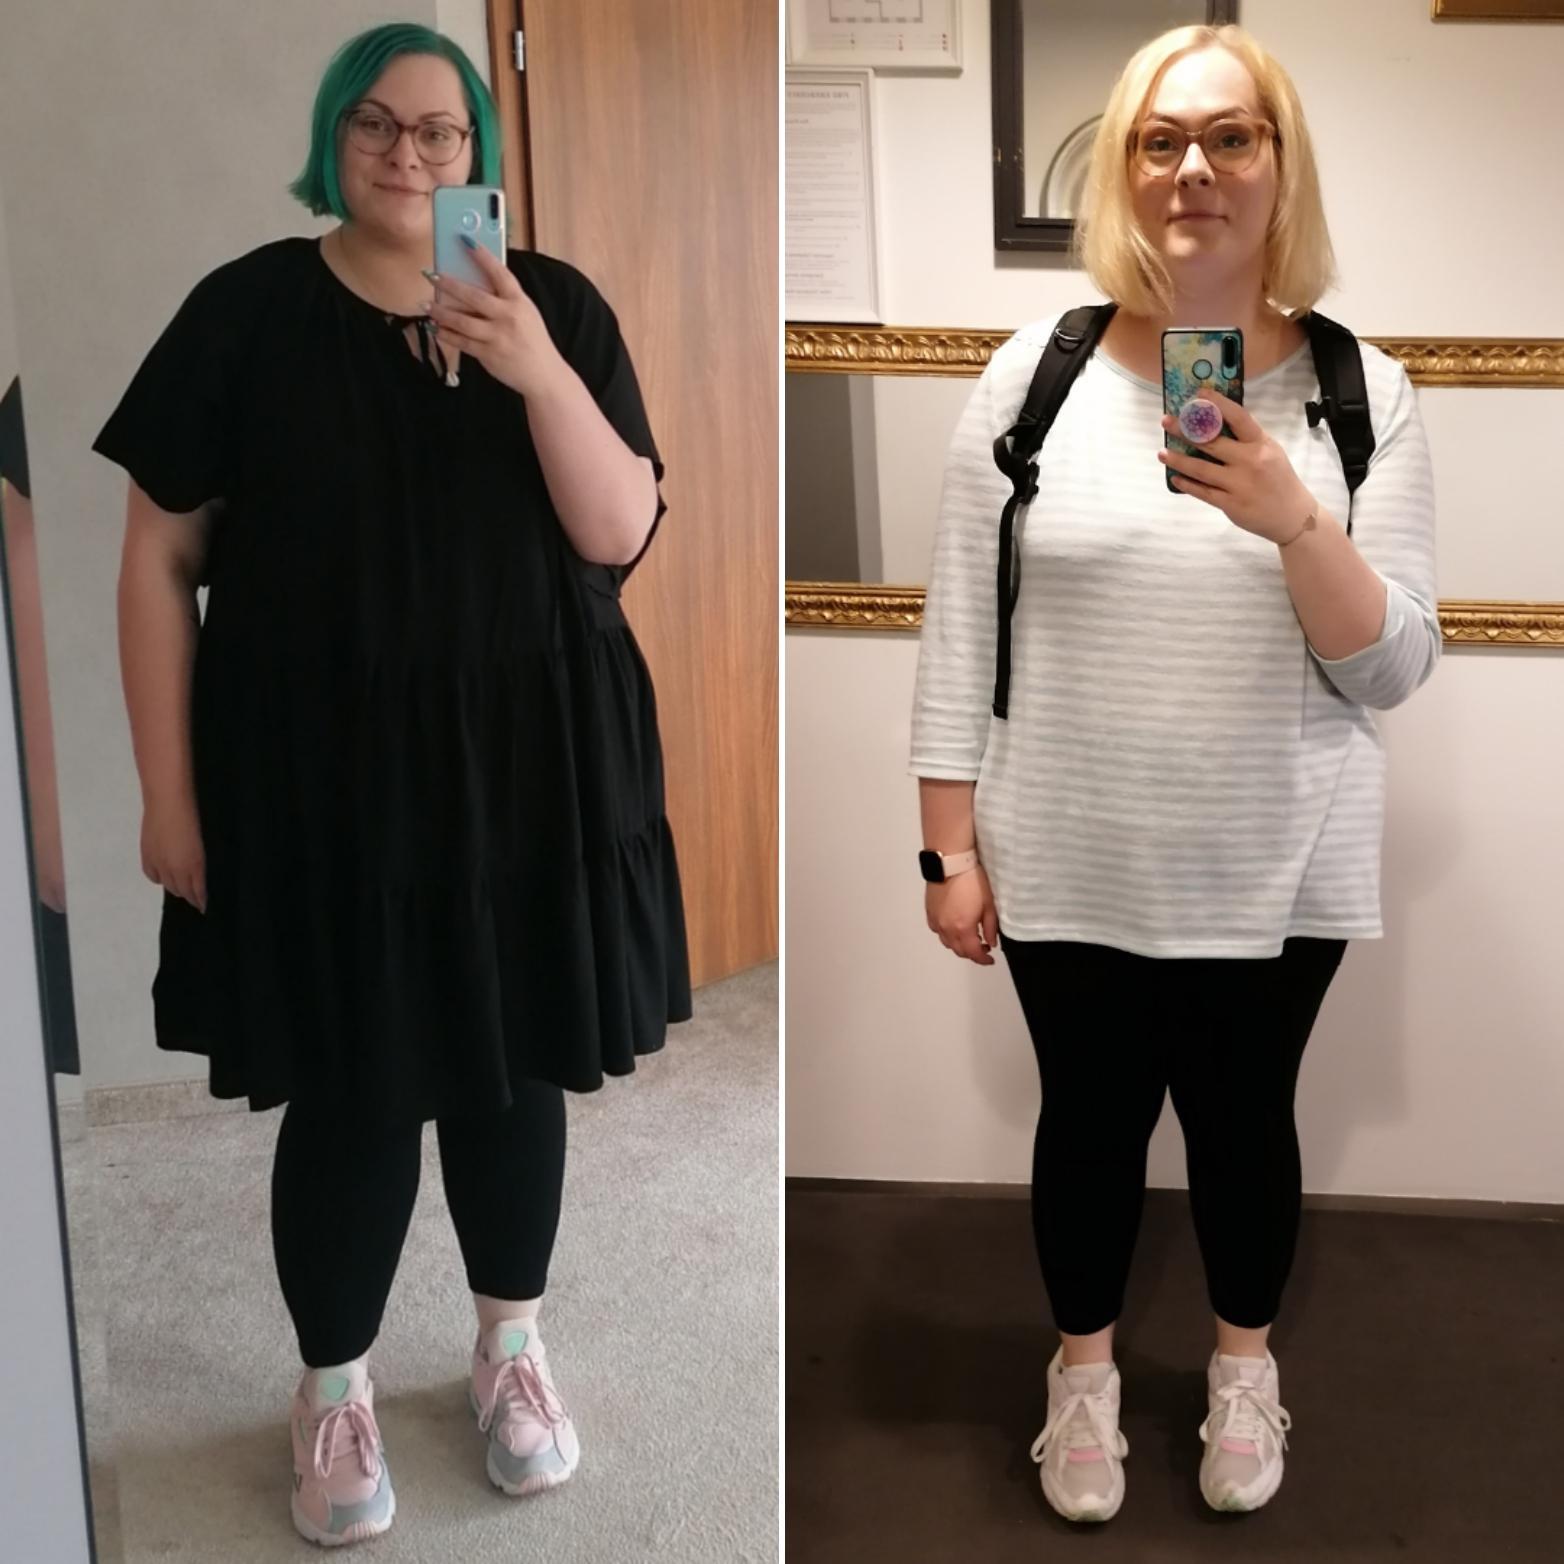 5 feet 8 Female 68 lbs Fat Loss 330 lbs to 262 lbs